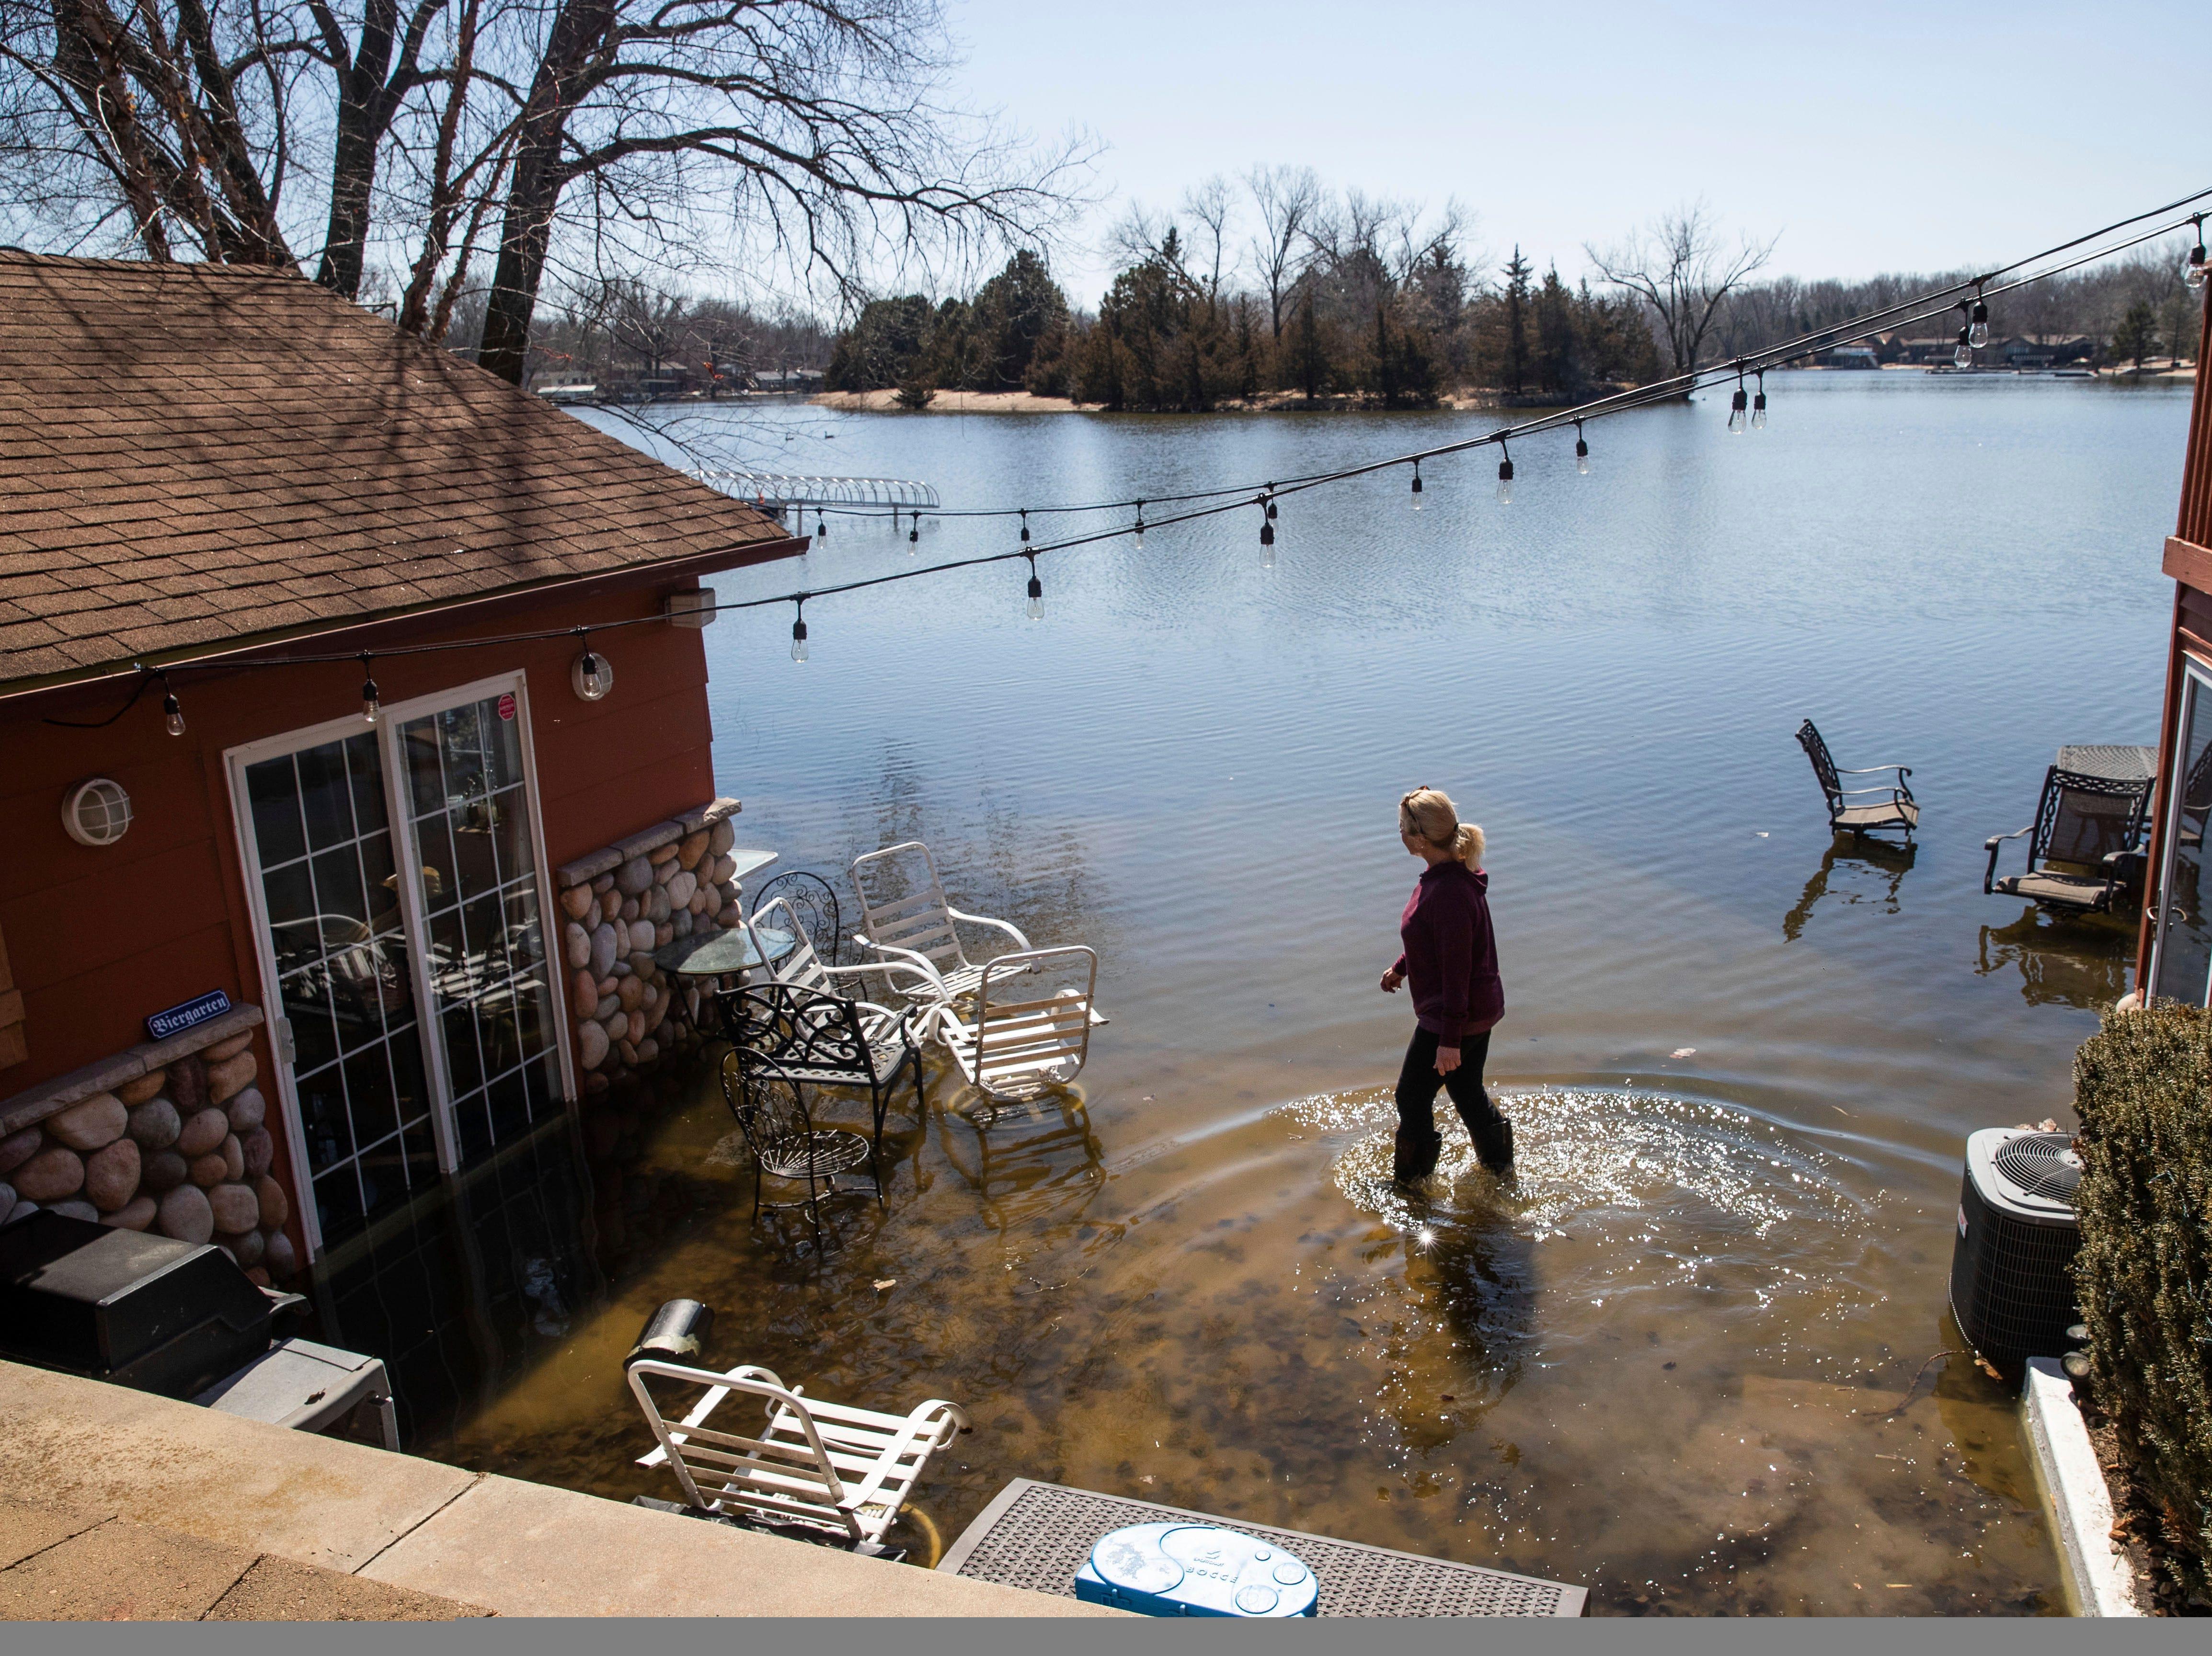 Lori Steinauer walks through a patio area at her flooded cabin Thursday, March 21, 2019, in Ashland, Neb.